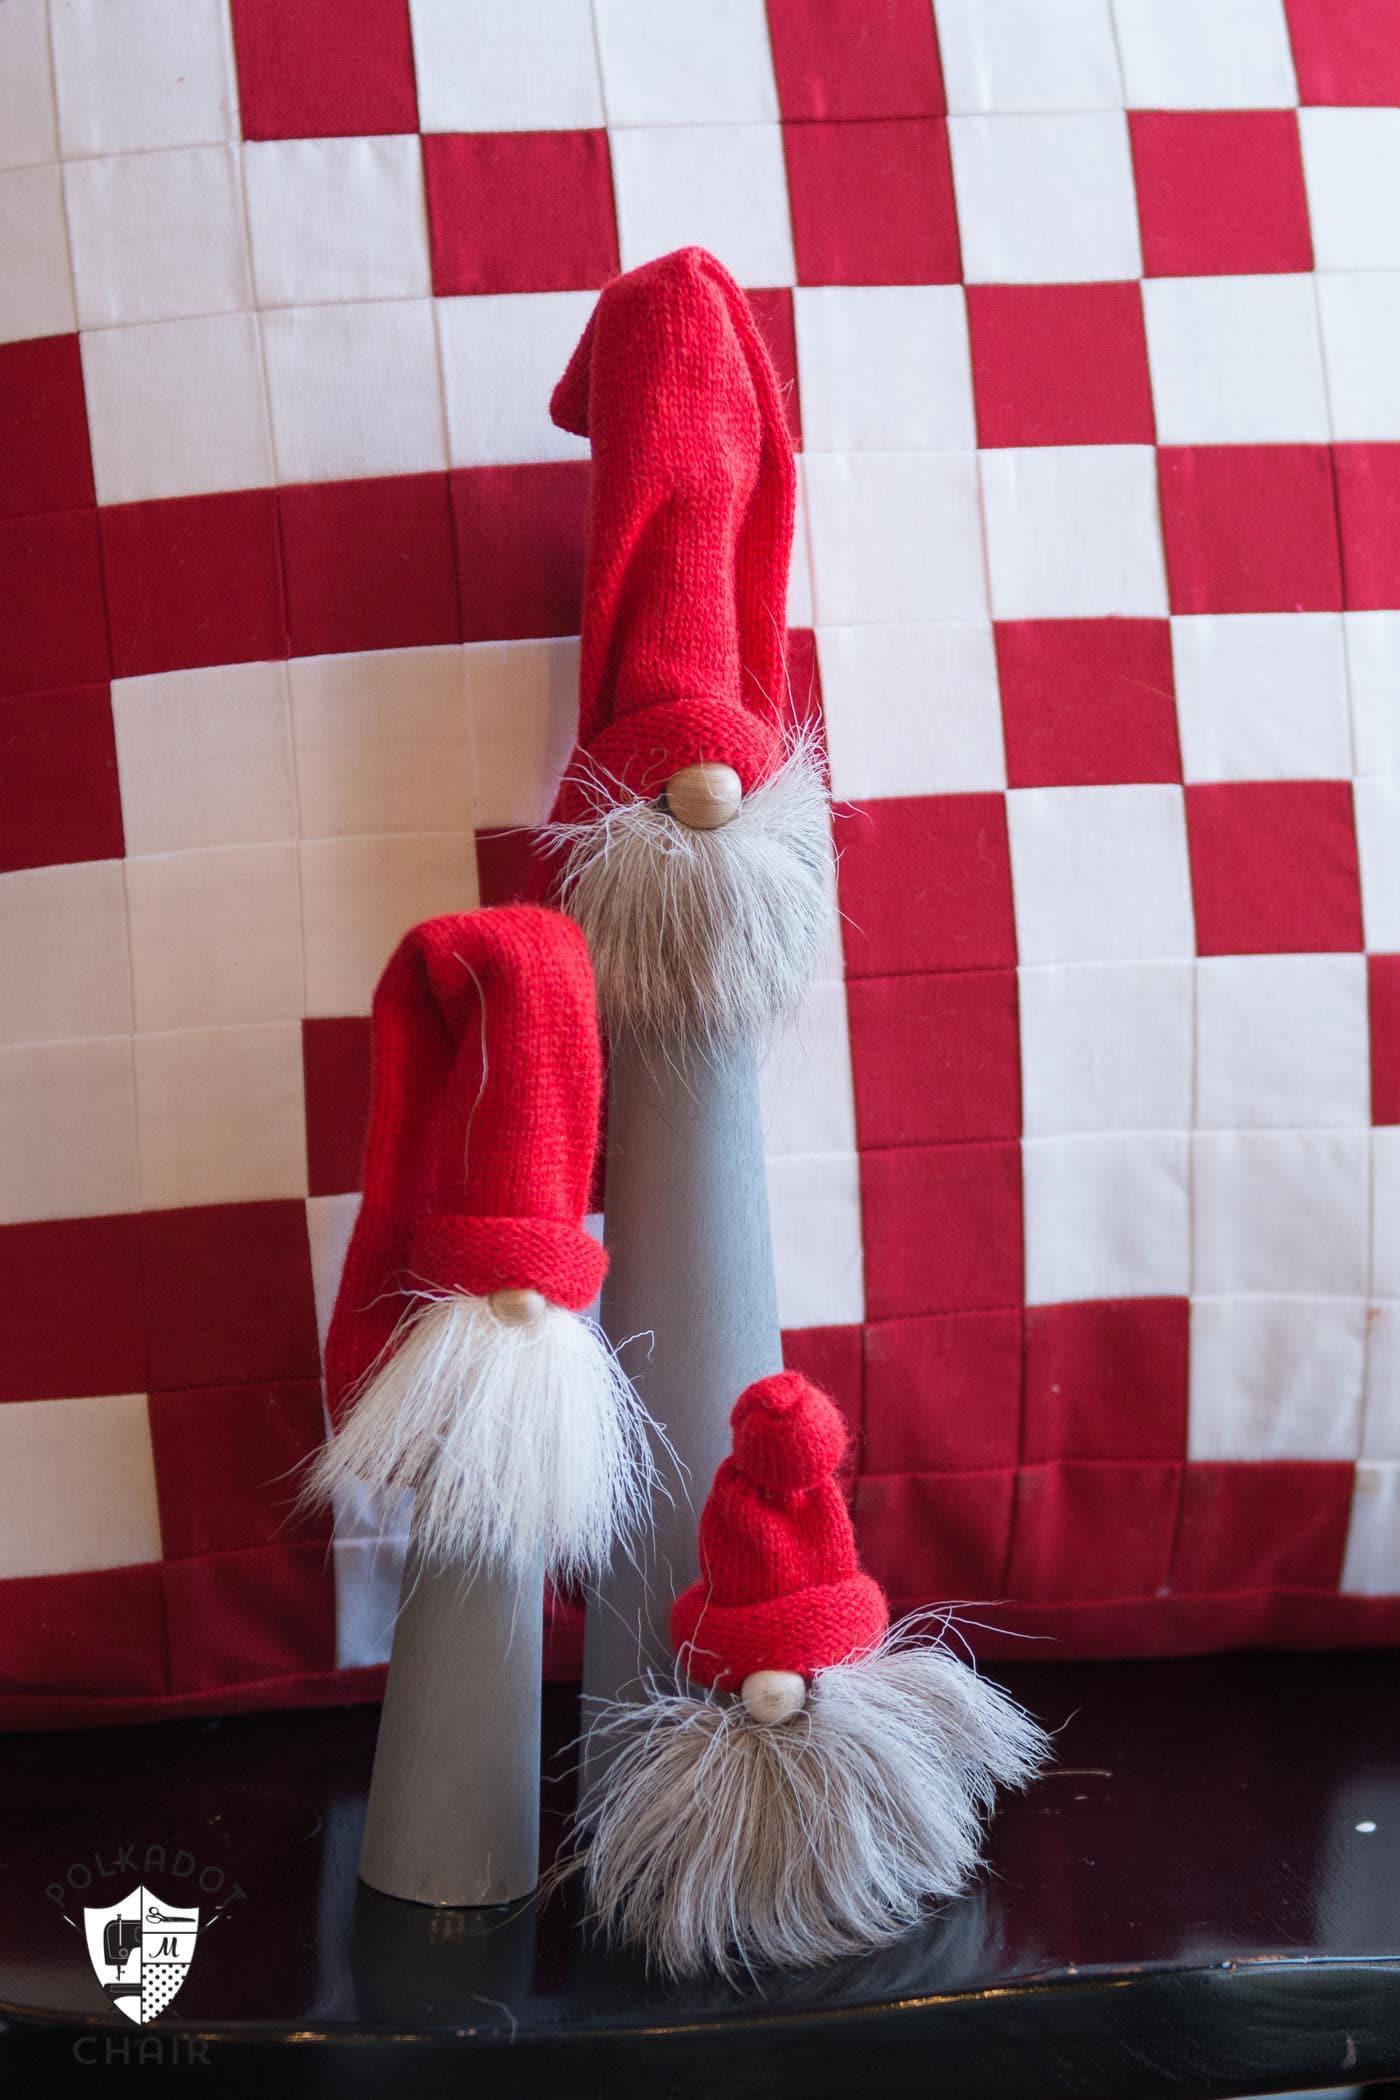 Tomte Christmas Gnome Pillow Pattern  The Polka Dot Chair